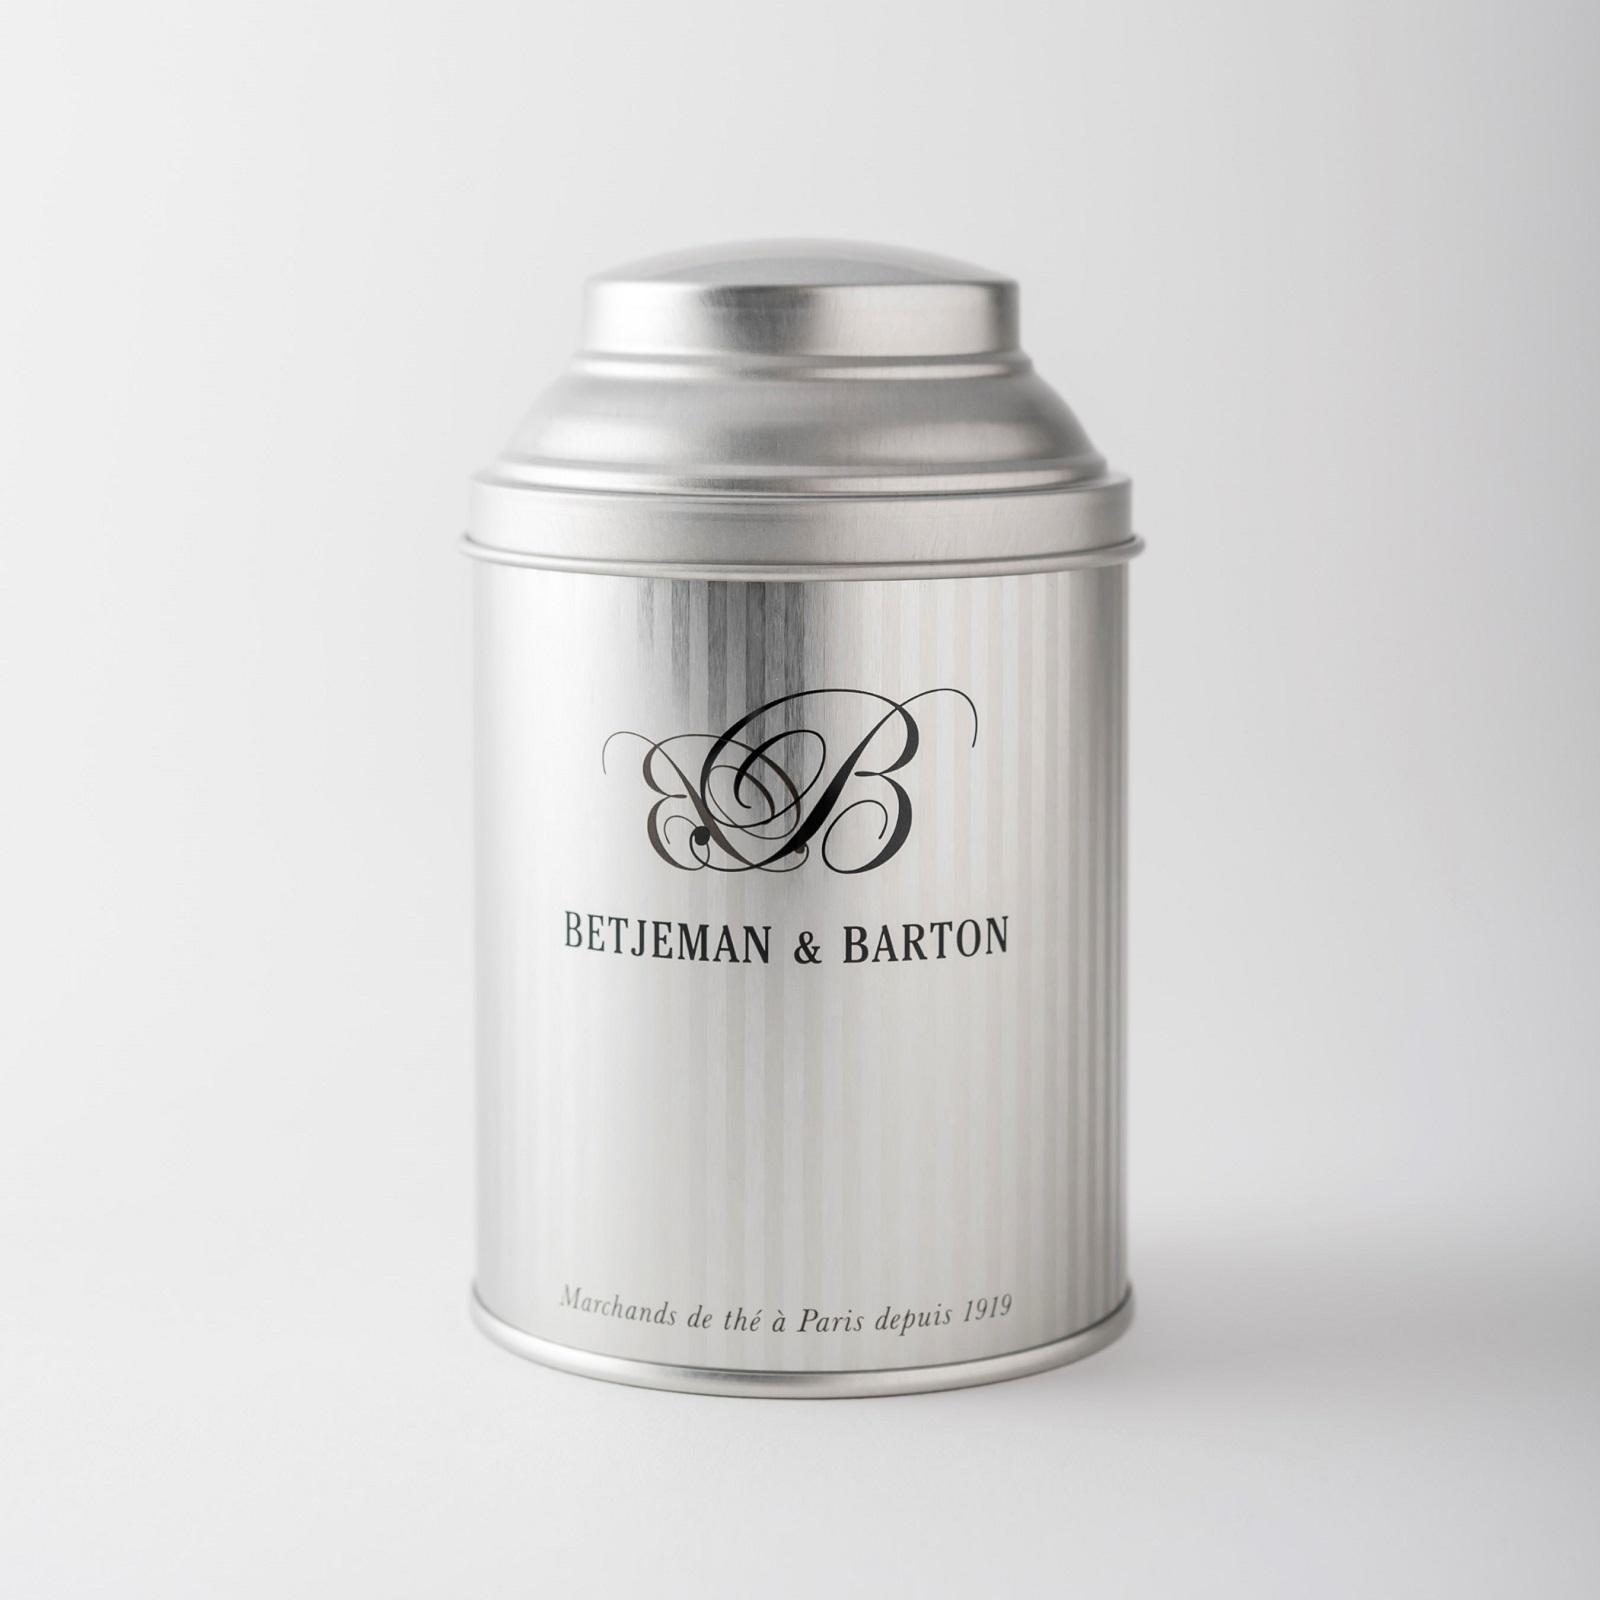 Autumn Blend オータムブレンド 70g缶